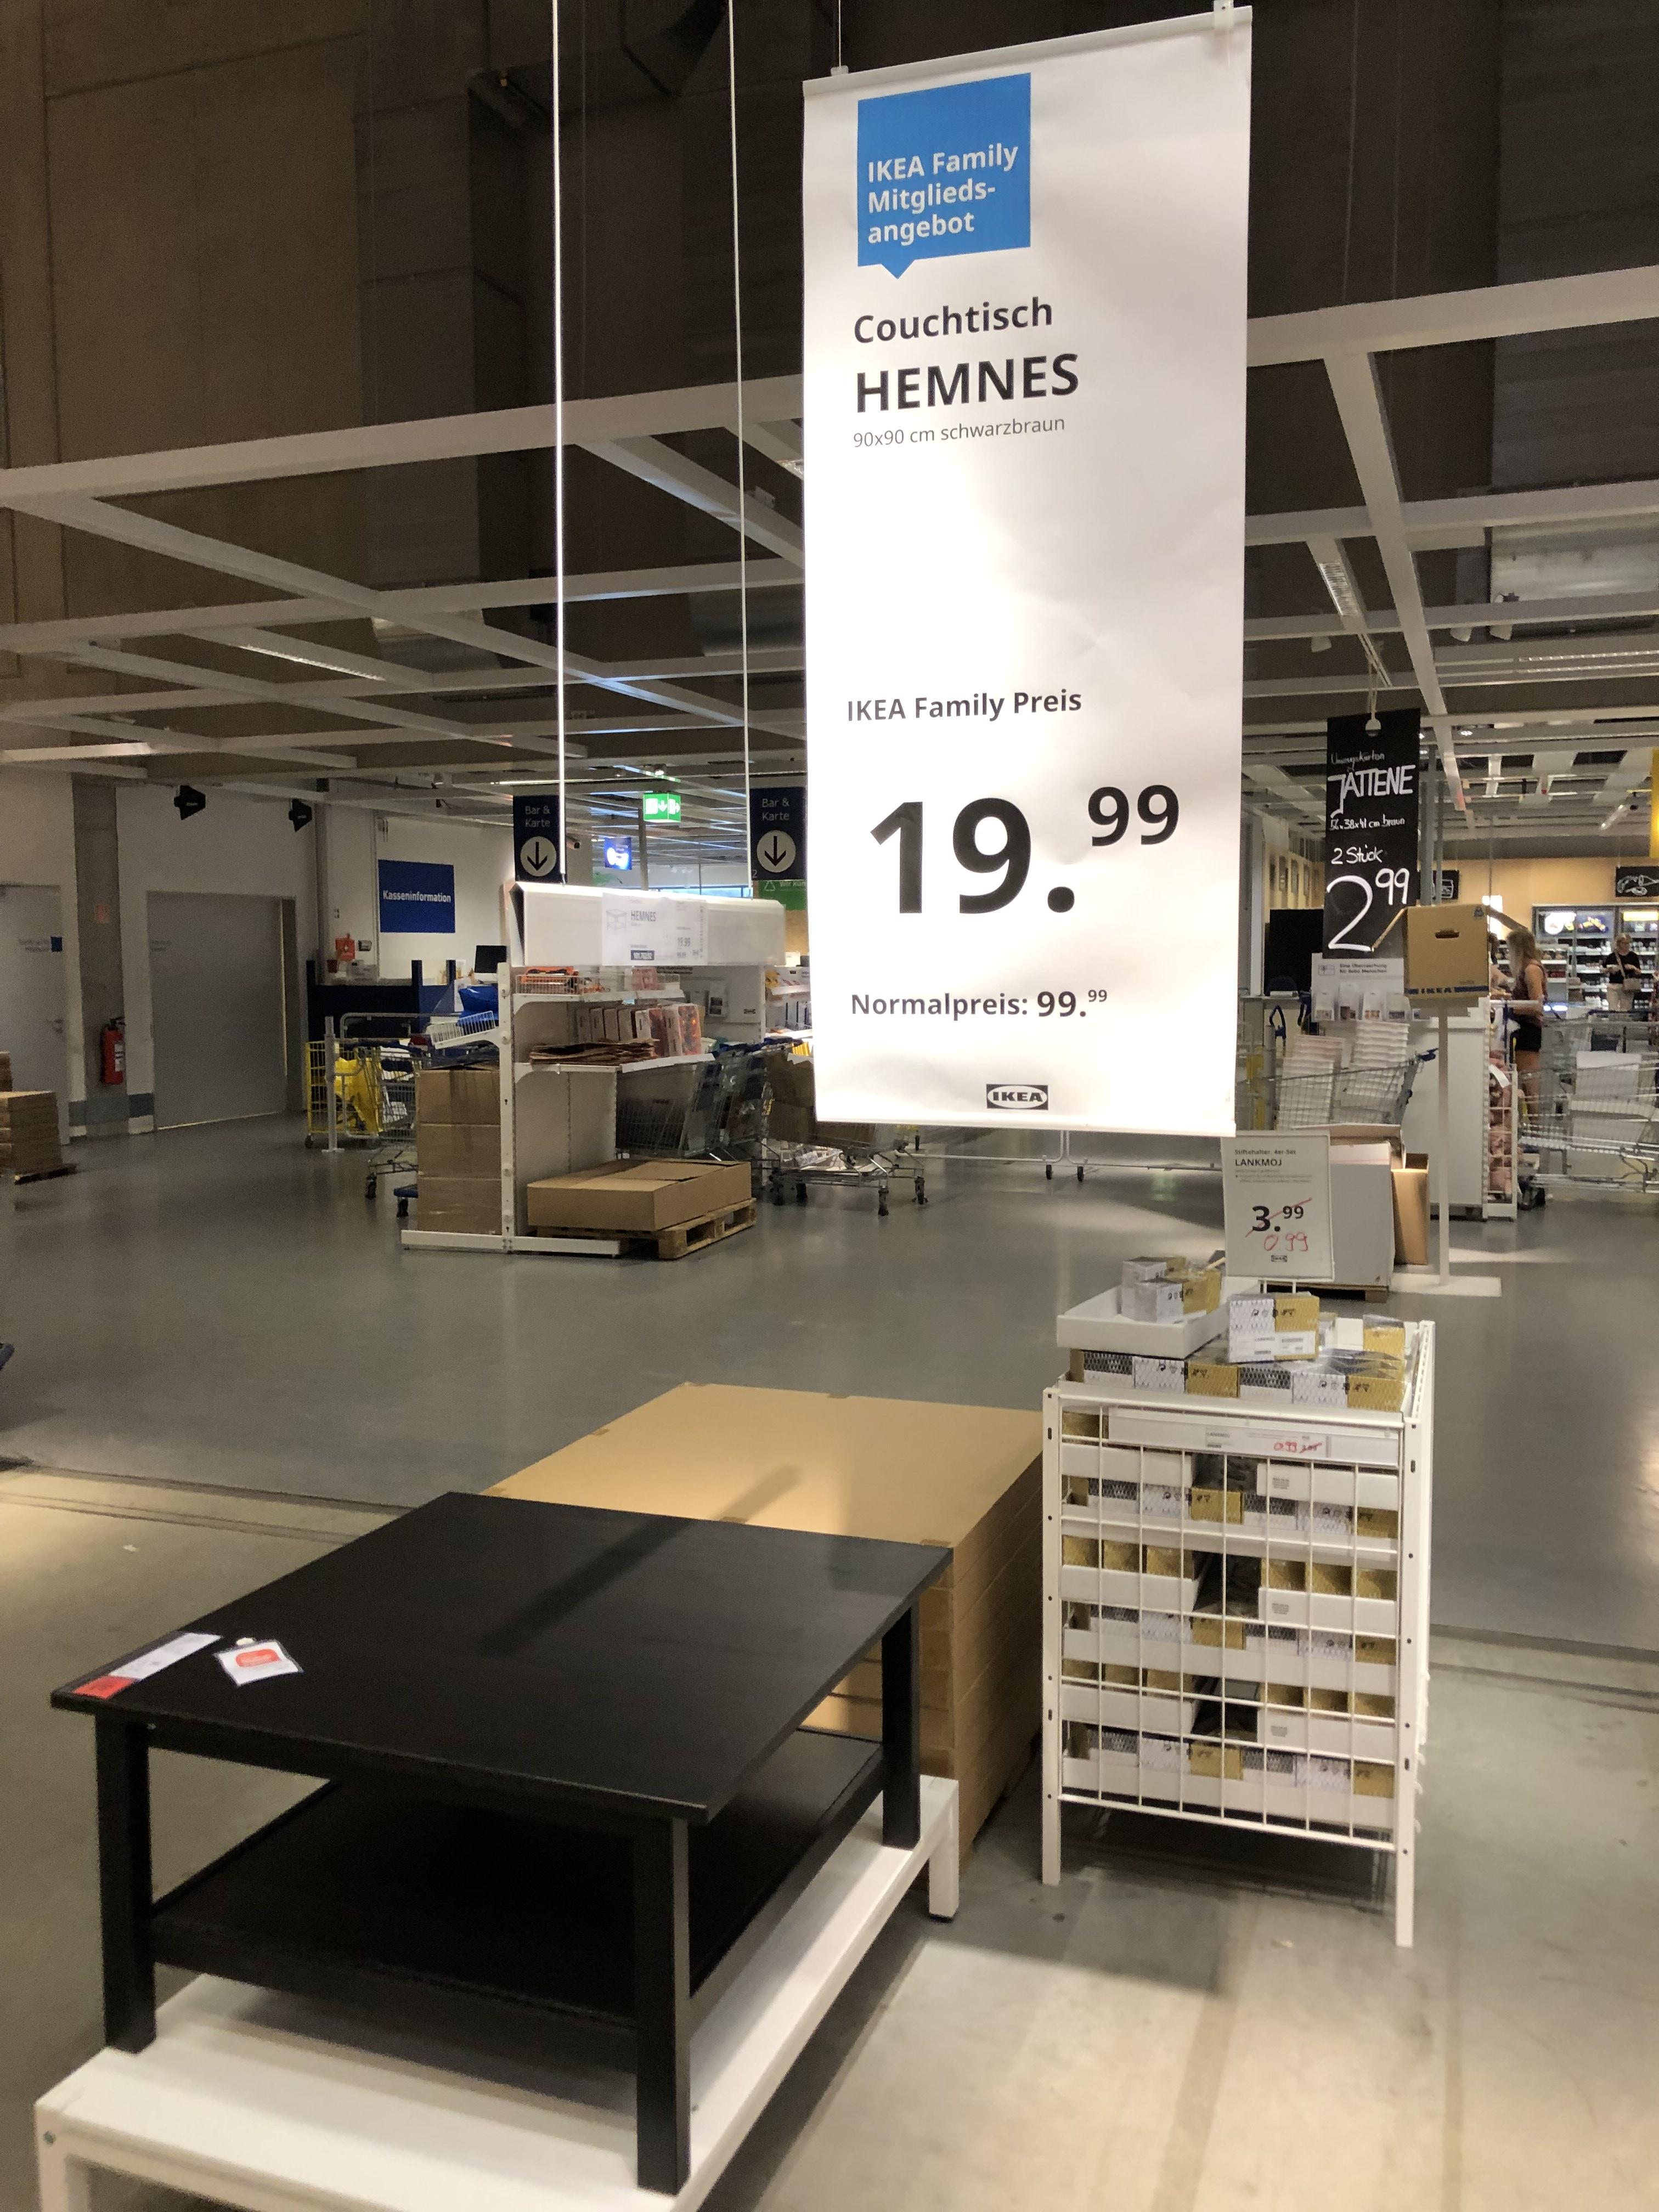 IKEA Hemnes Couchtisch Schwarzbraun - Hannover/Laatzen [Lokal]